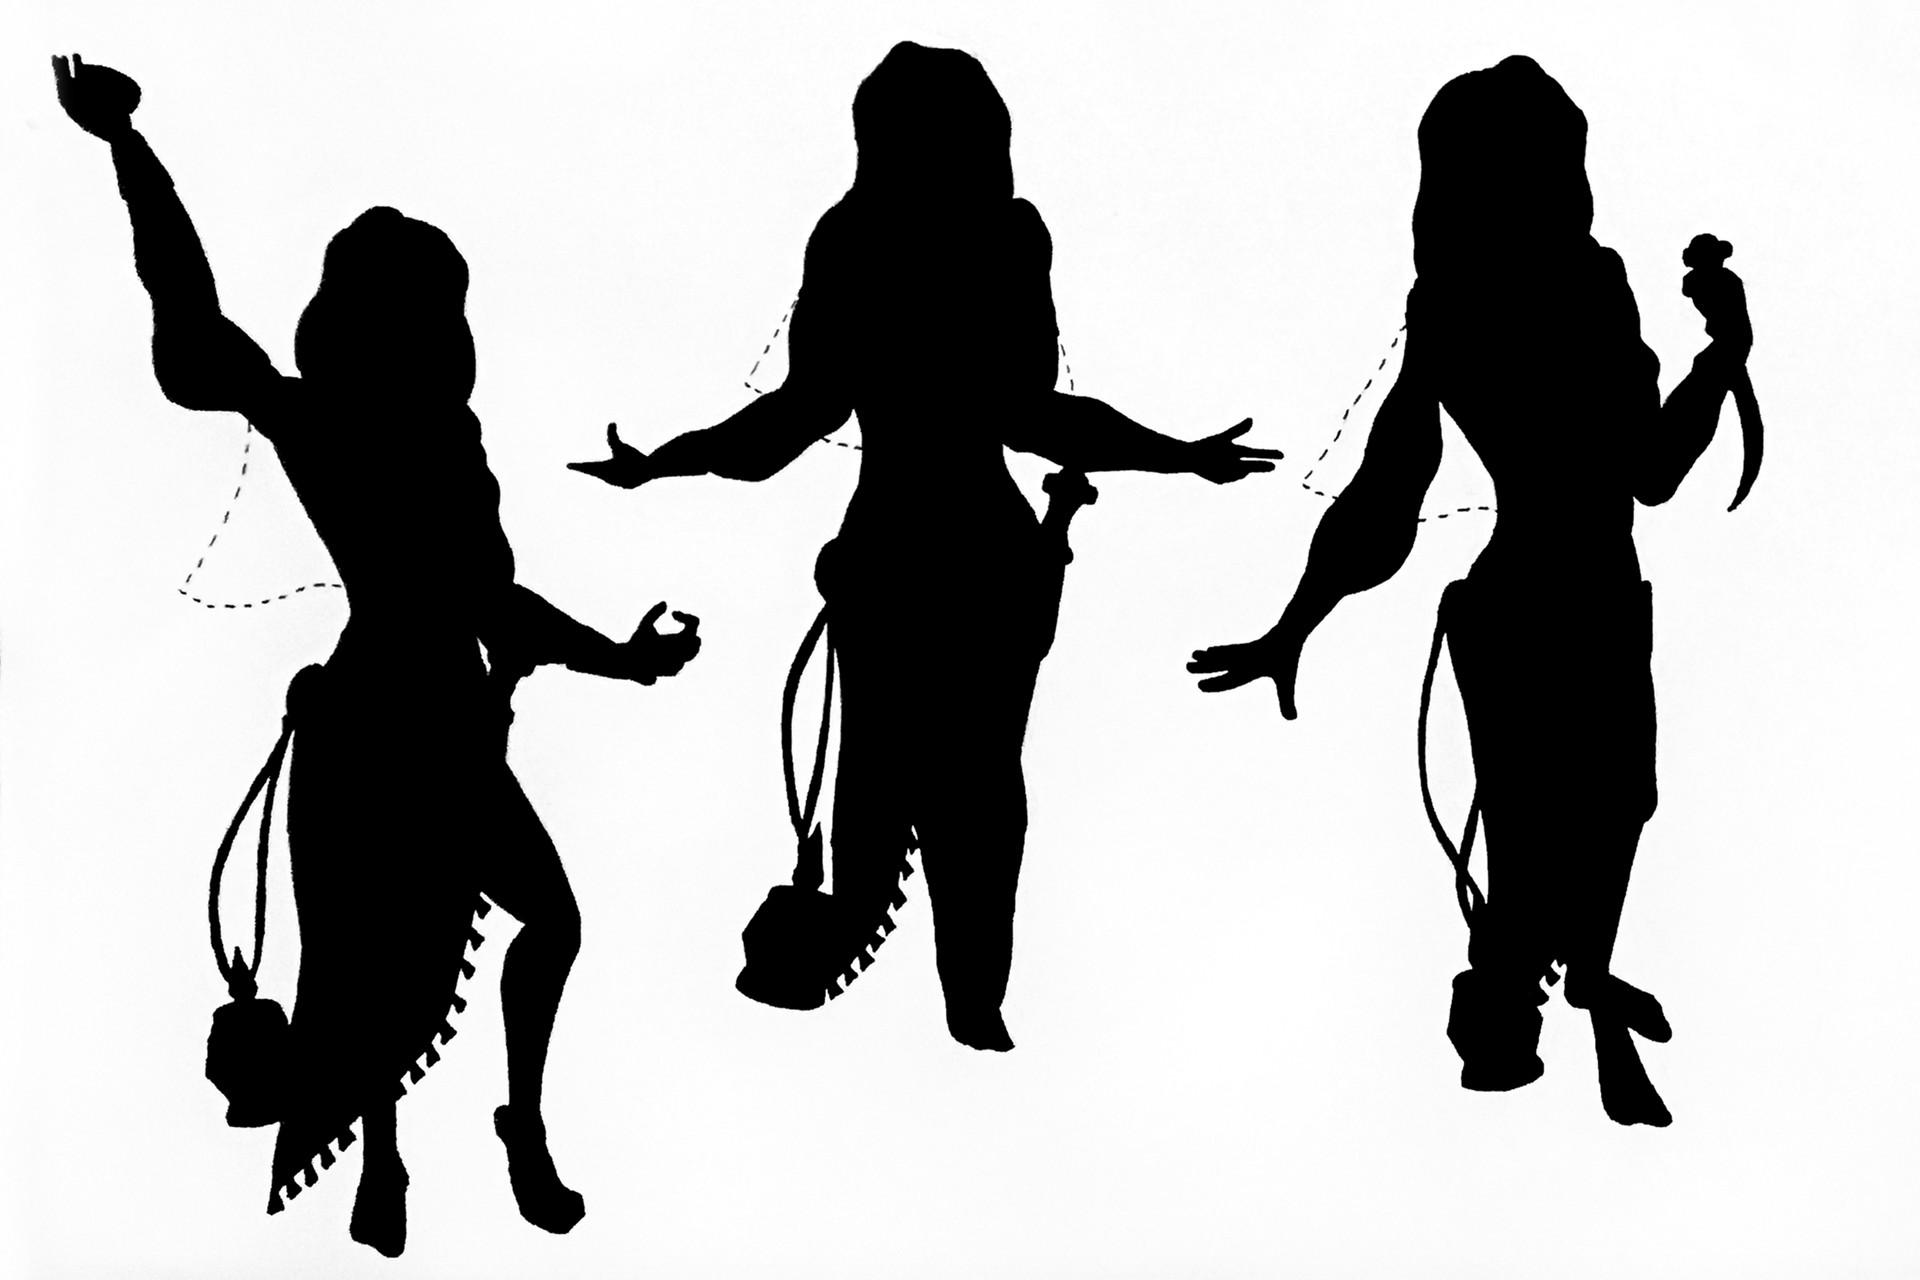 Character Design Silhouette Tutorial : Artstation art character silhouettes gerard mirabelli